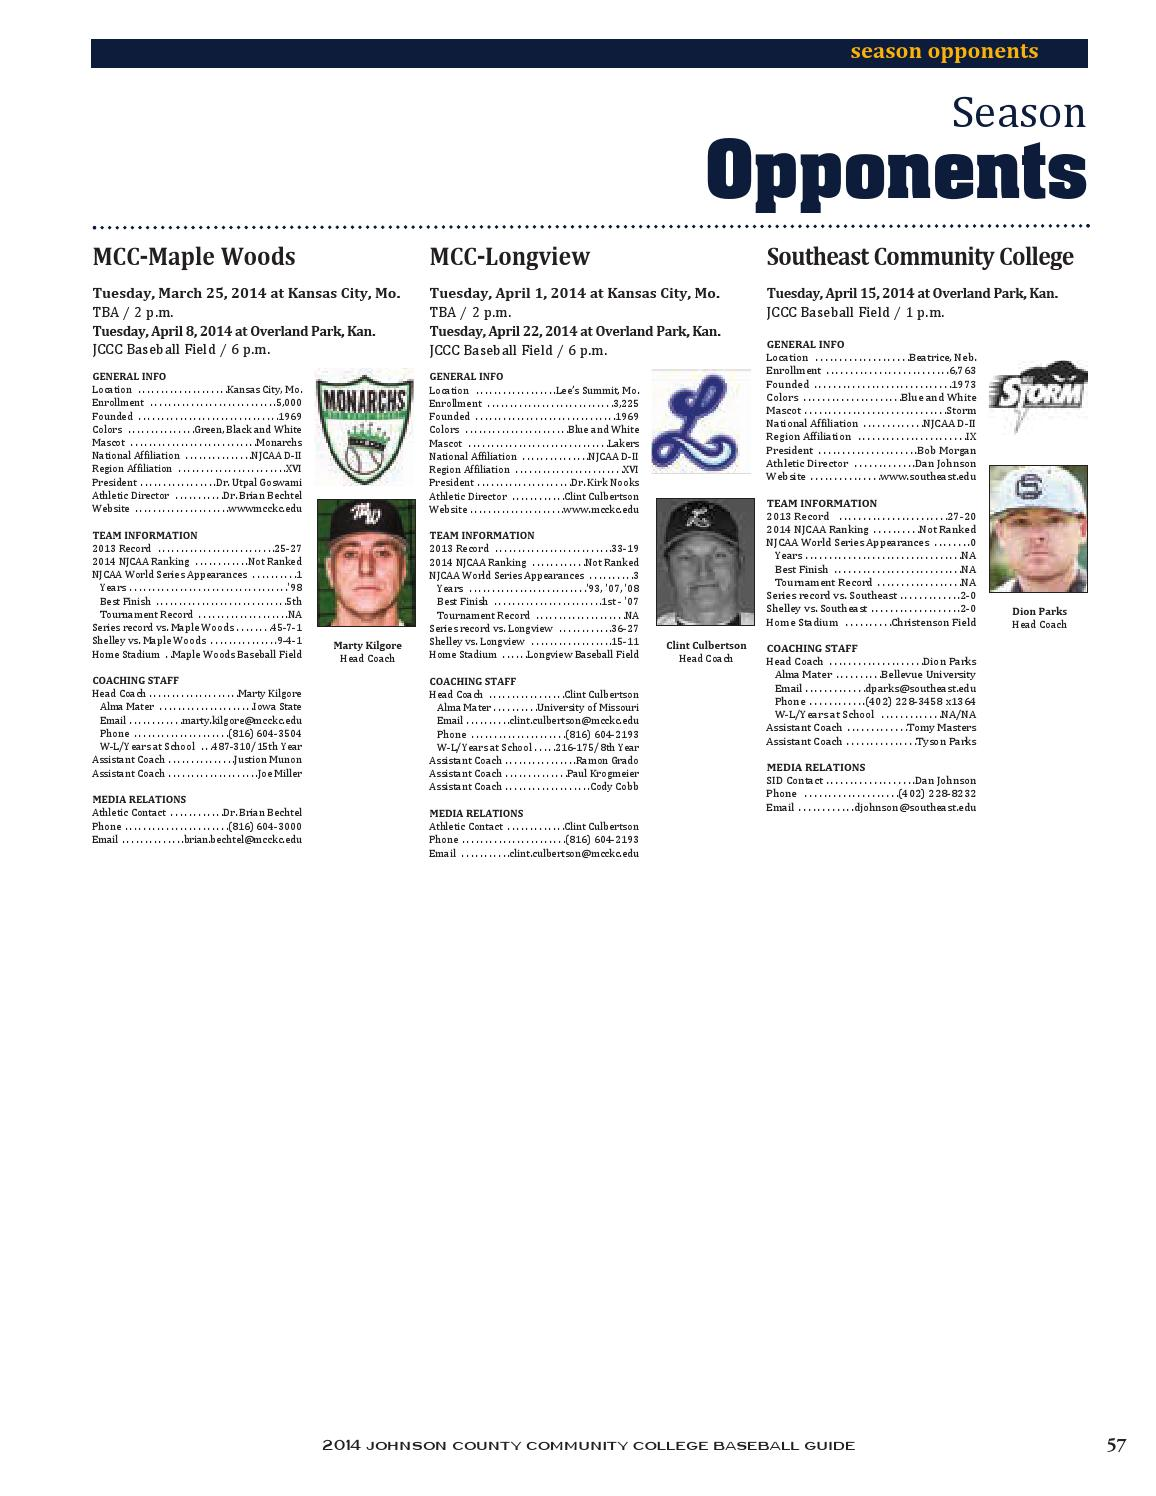 Spring 14 baseball media guide by Chris Gray - issuu